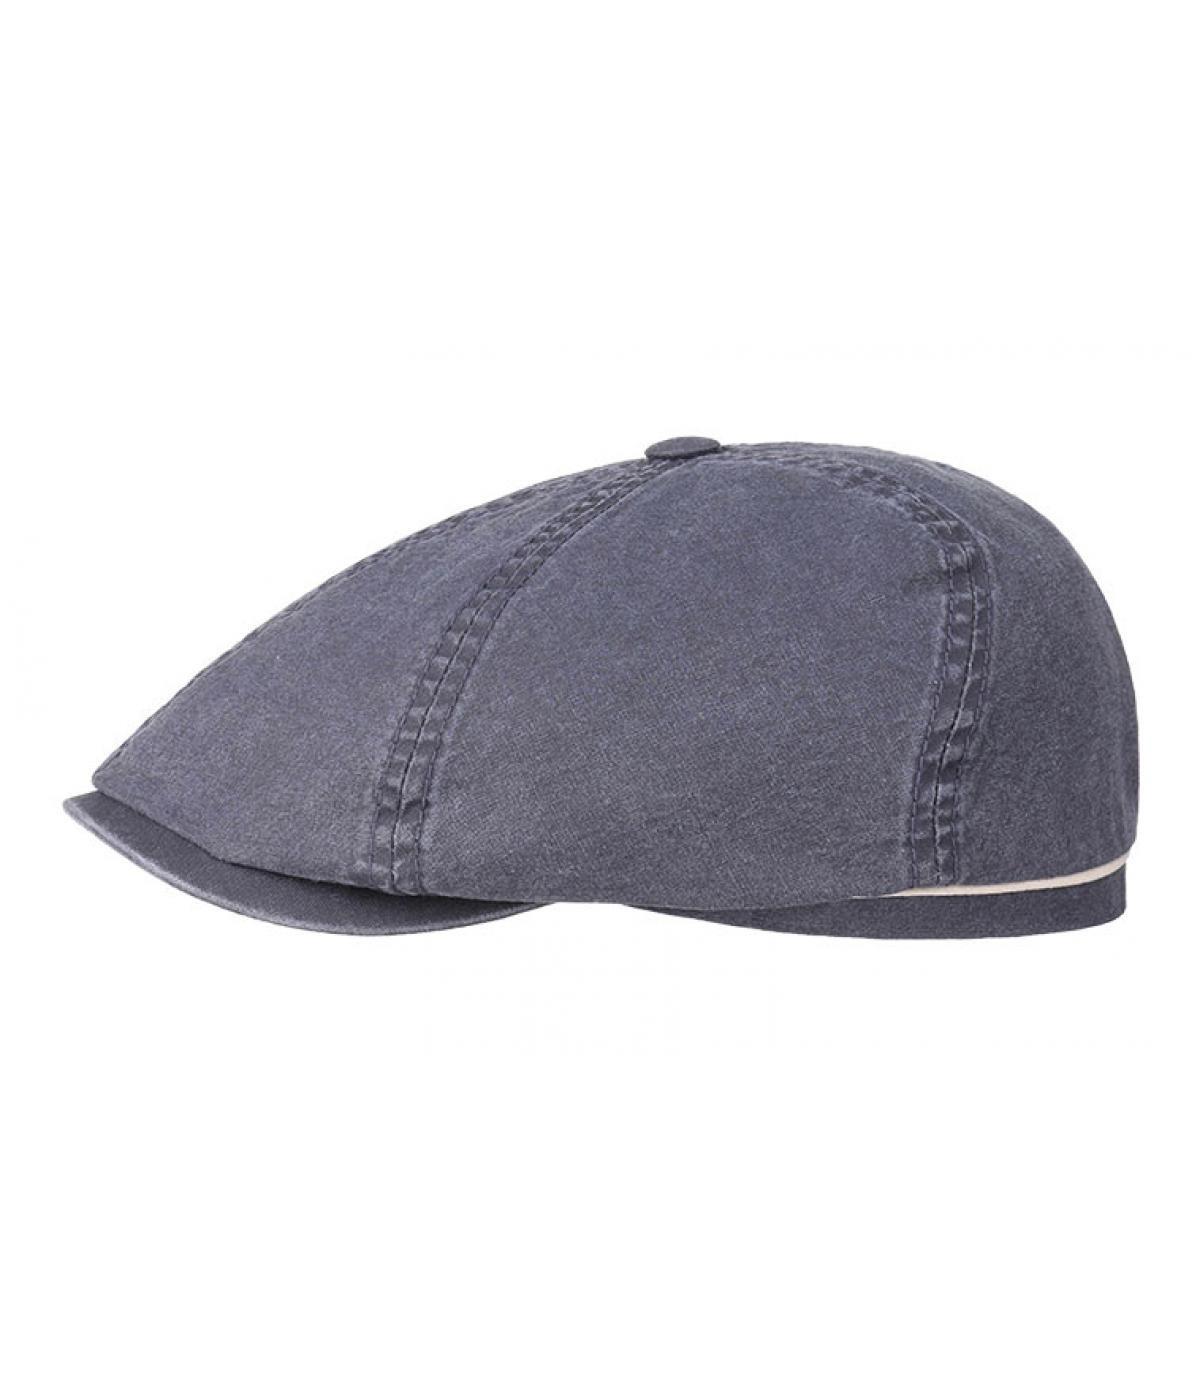 Détails Brooklyn cap delave coton organic bleu - image 2